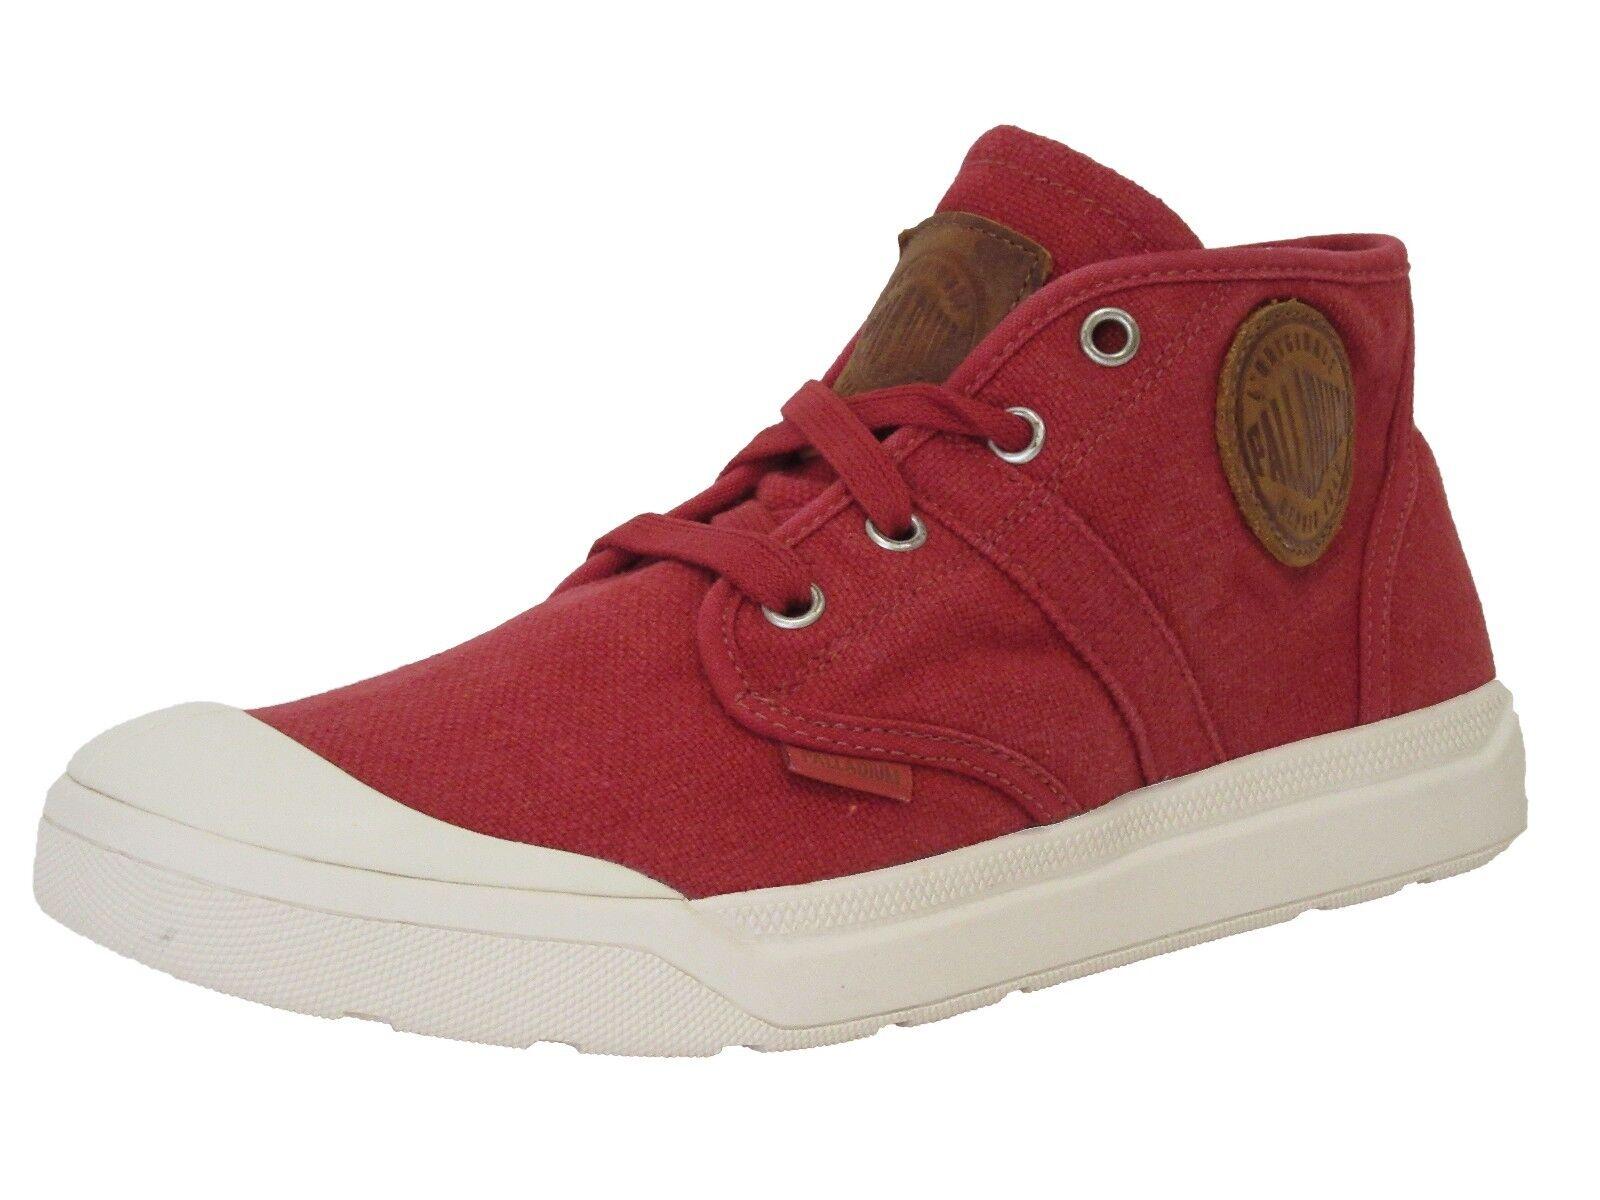 Scarpe casual da uomo Palladium Pallarue Mid Lc uomos Canvas Sneakers Shoes 8.5 D(M) US / 41.5 EUR